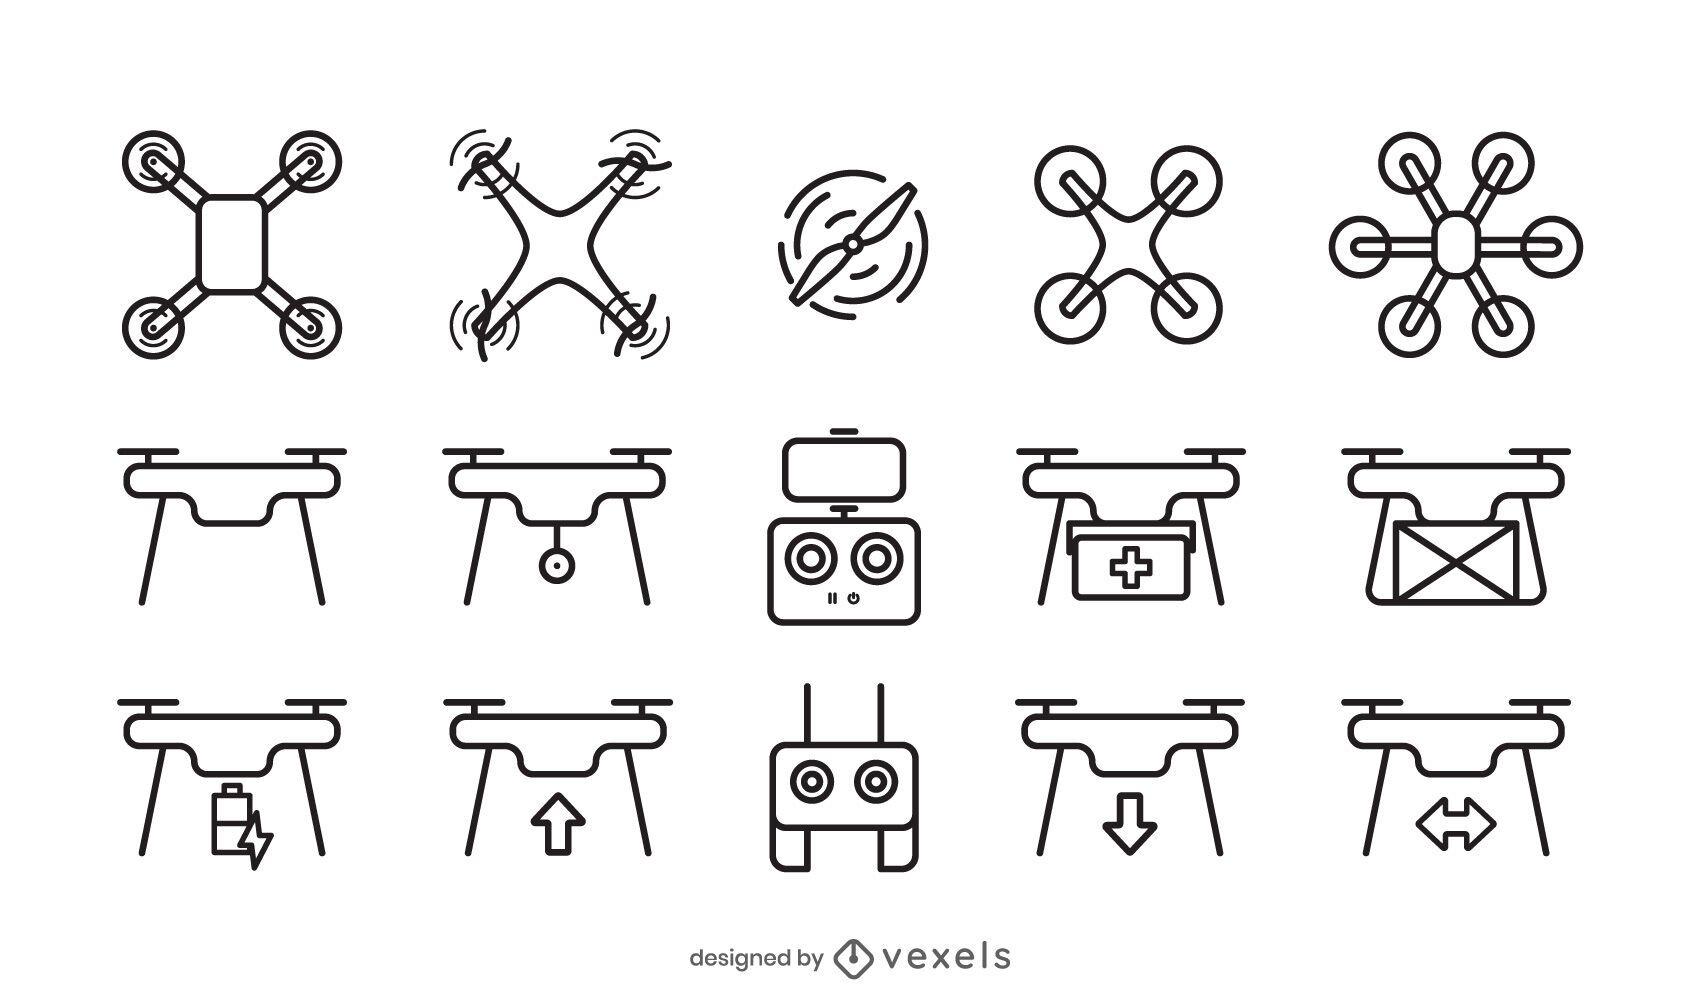 drone icon stroke set